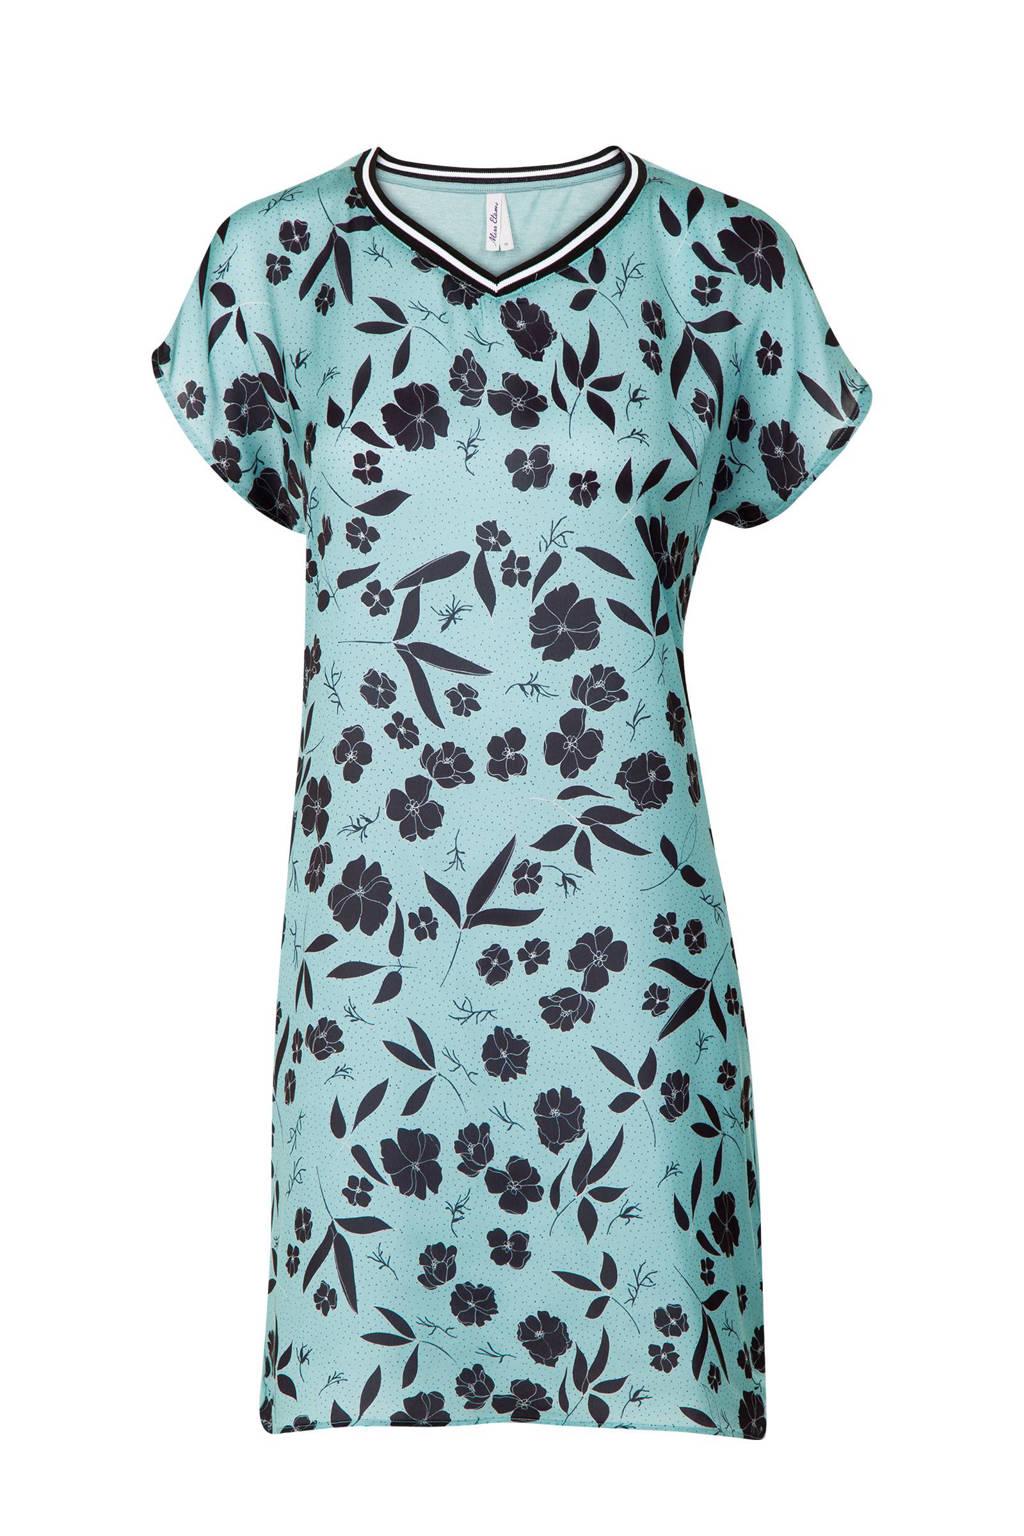 Miss Etam Lang tuniek met bloemenprint, Turquoise